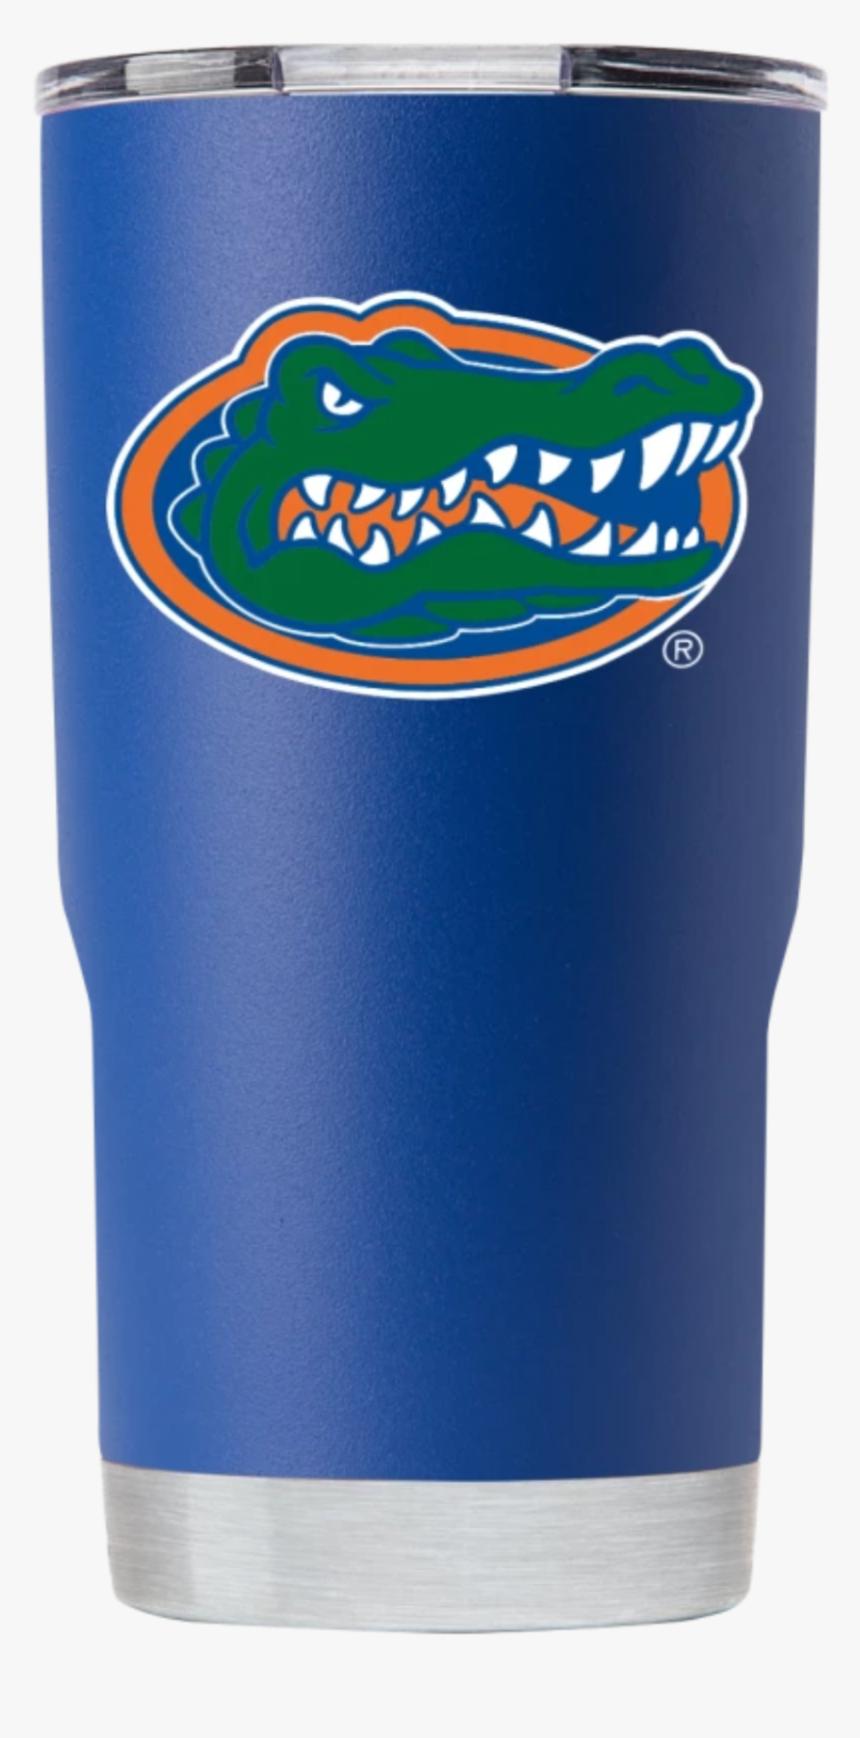 "Florida Gator Head Blue Gametime Sidekick Tumbler""  - Florida Gators, HD Png Download, Free Download"